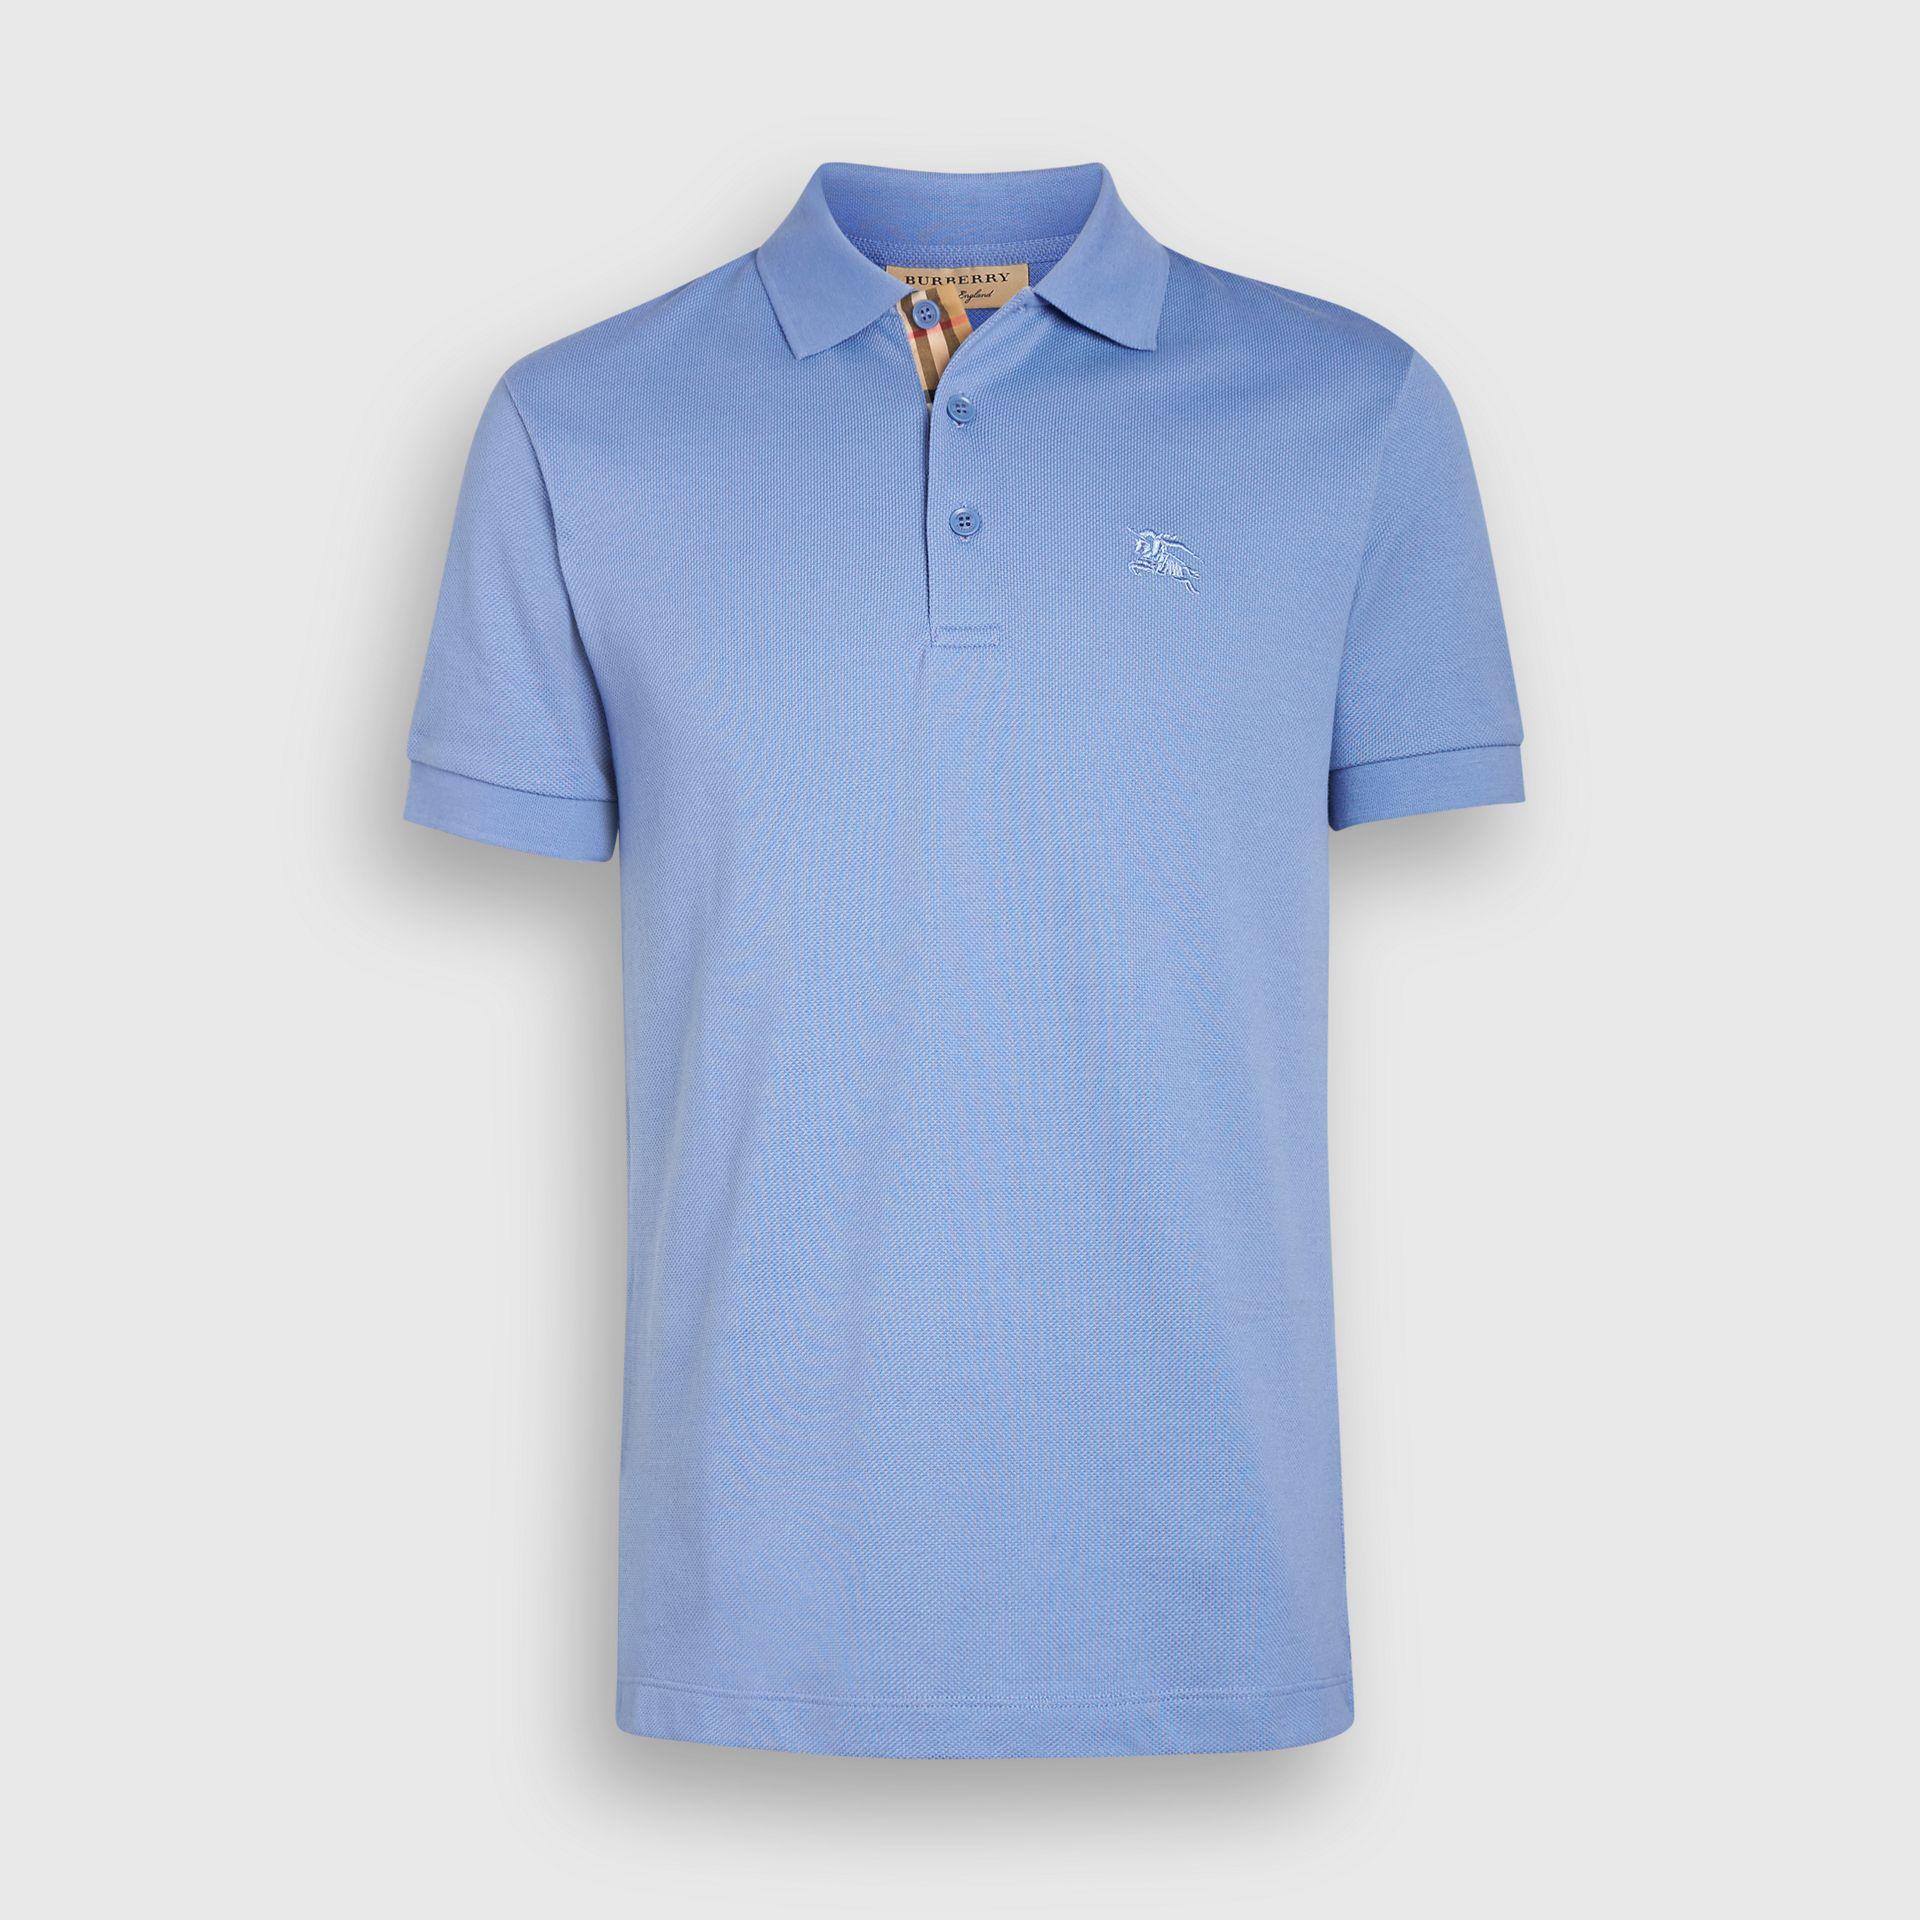 64e35be62f08 Burberry Logo-Embroidered Cotton-PiquÉ Polo Shirt In Blue